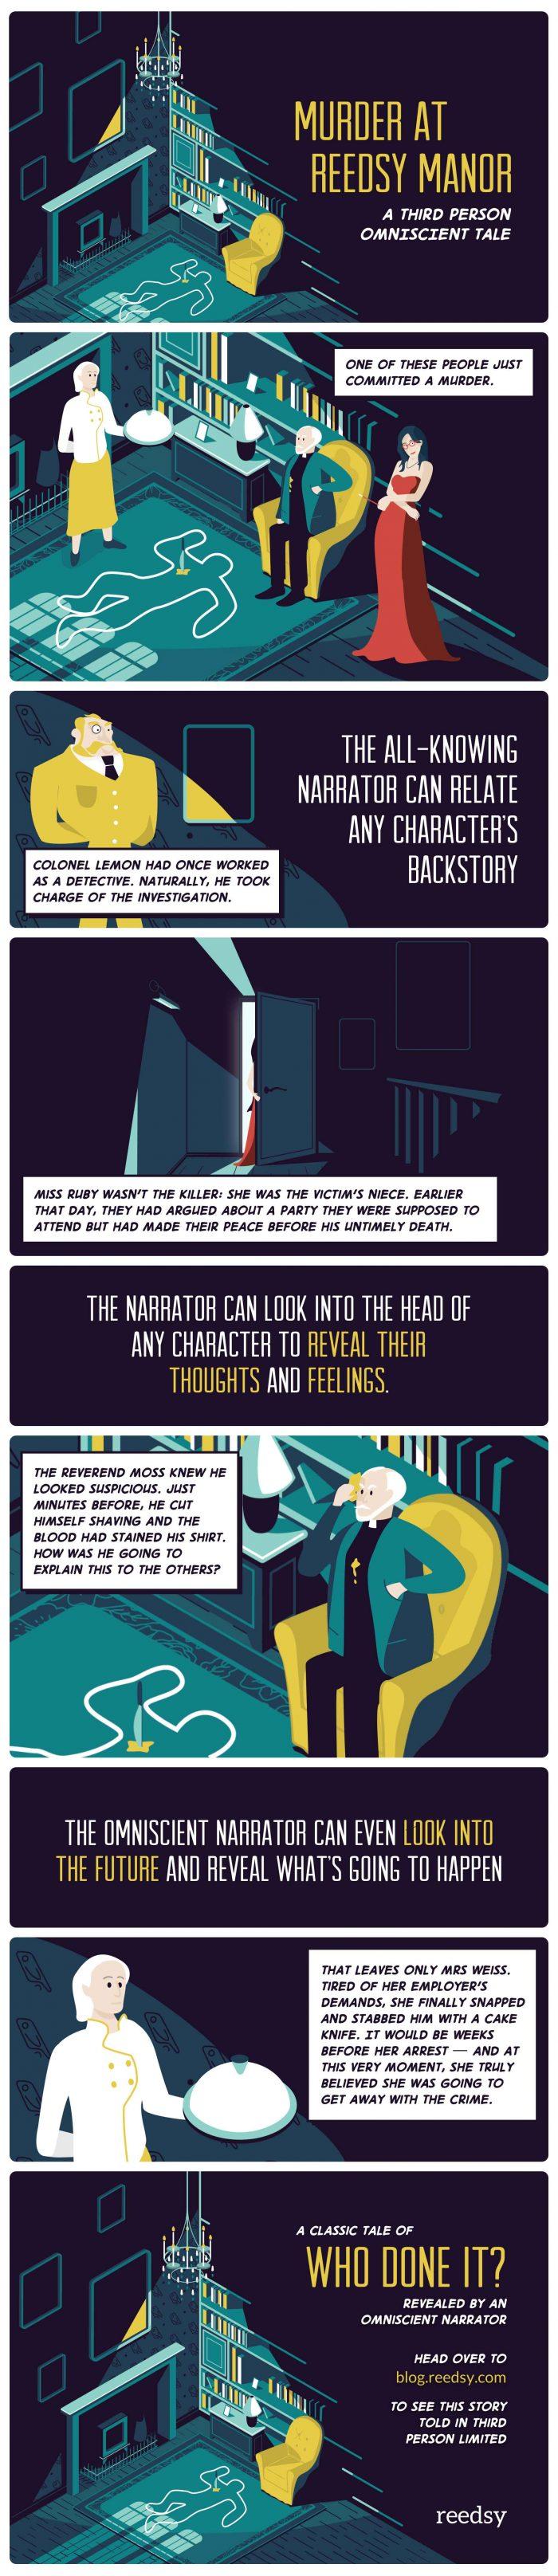 infographic-third-person-omniscient-700x3232